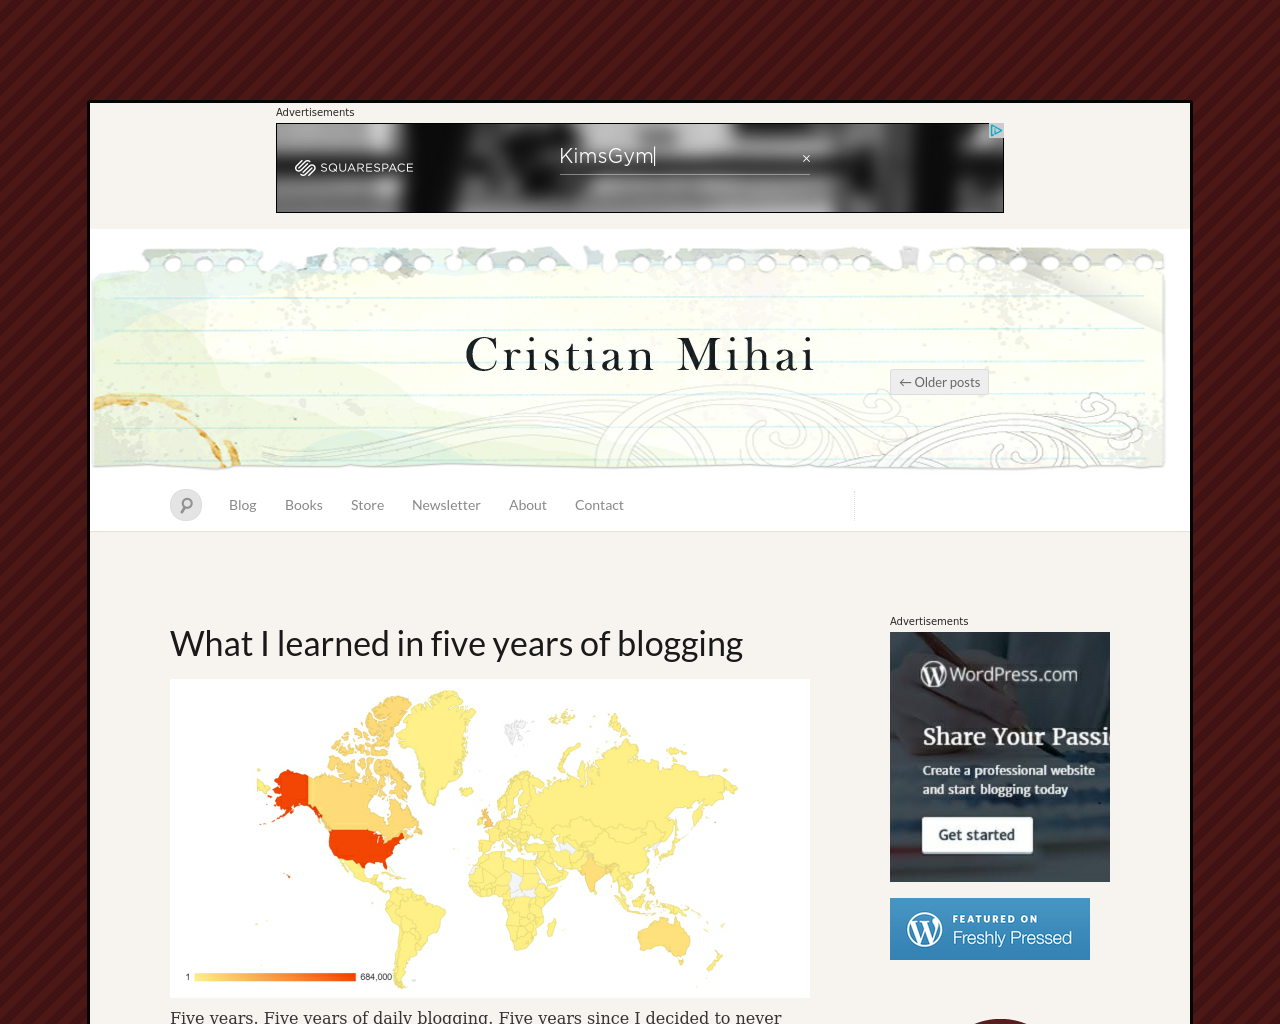 Christian-Mihai-Advertising-Reviews-Pricing